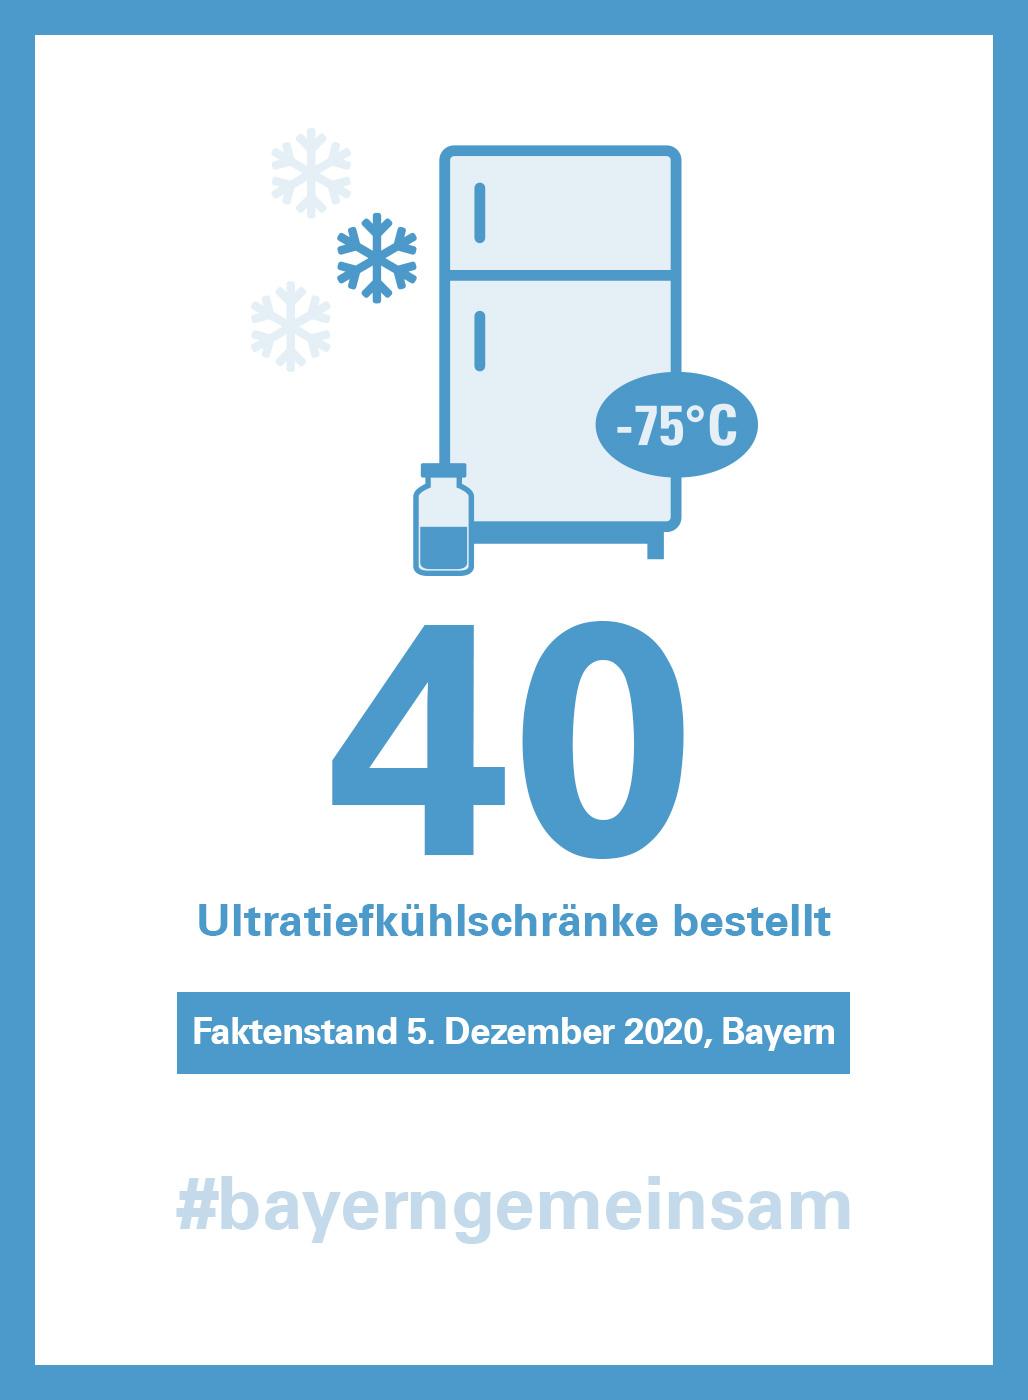 Corona-Infografik zum Thema Impfen: Bayern hat 40 Ultratiefkühlschränke bestellt (Stand: 5. Dezember 2020)